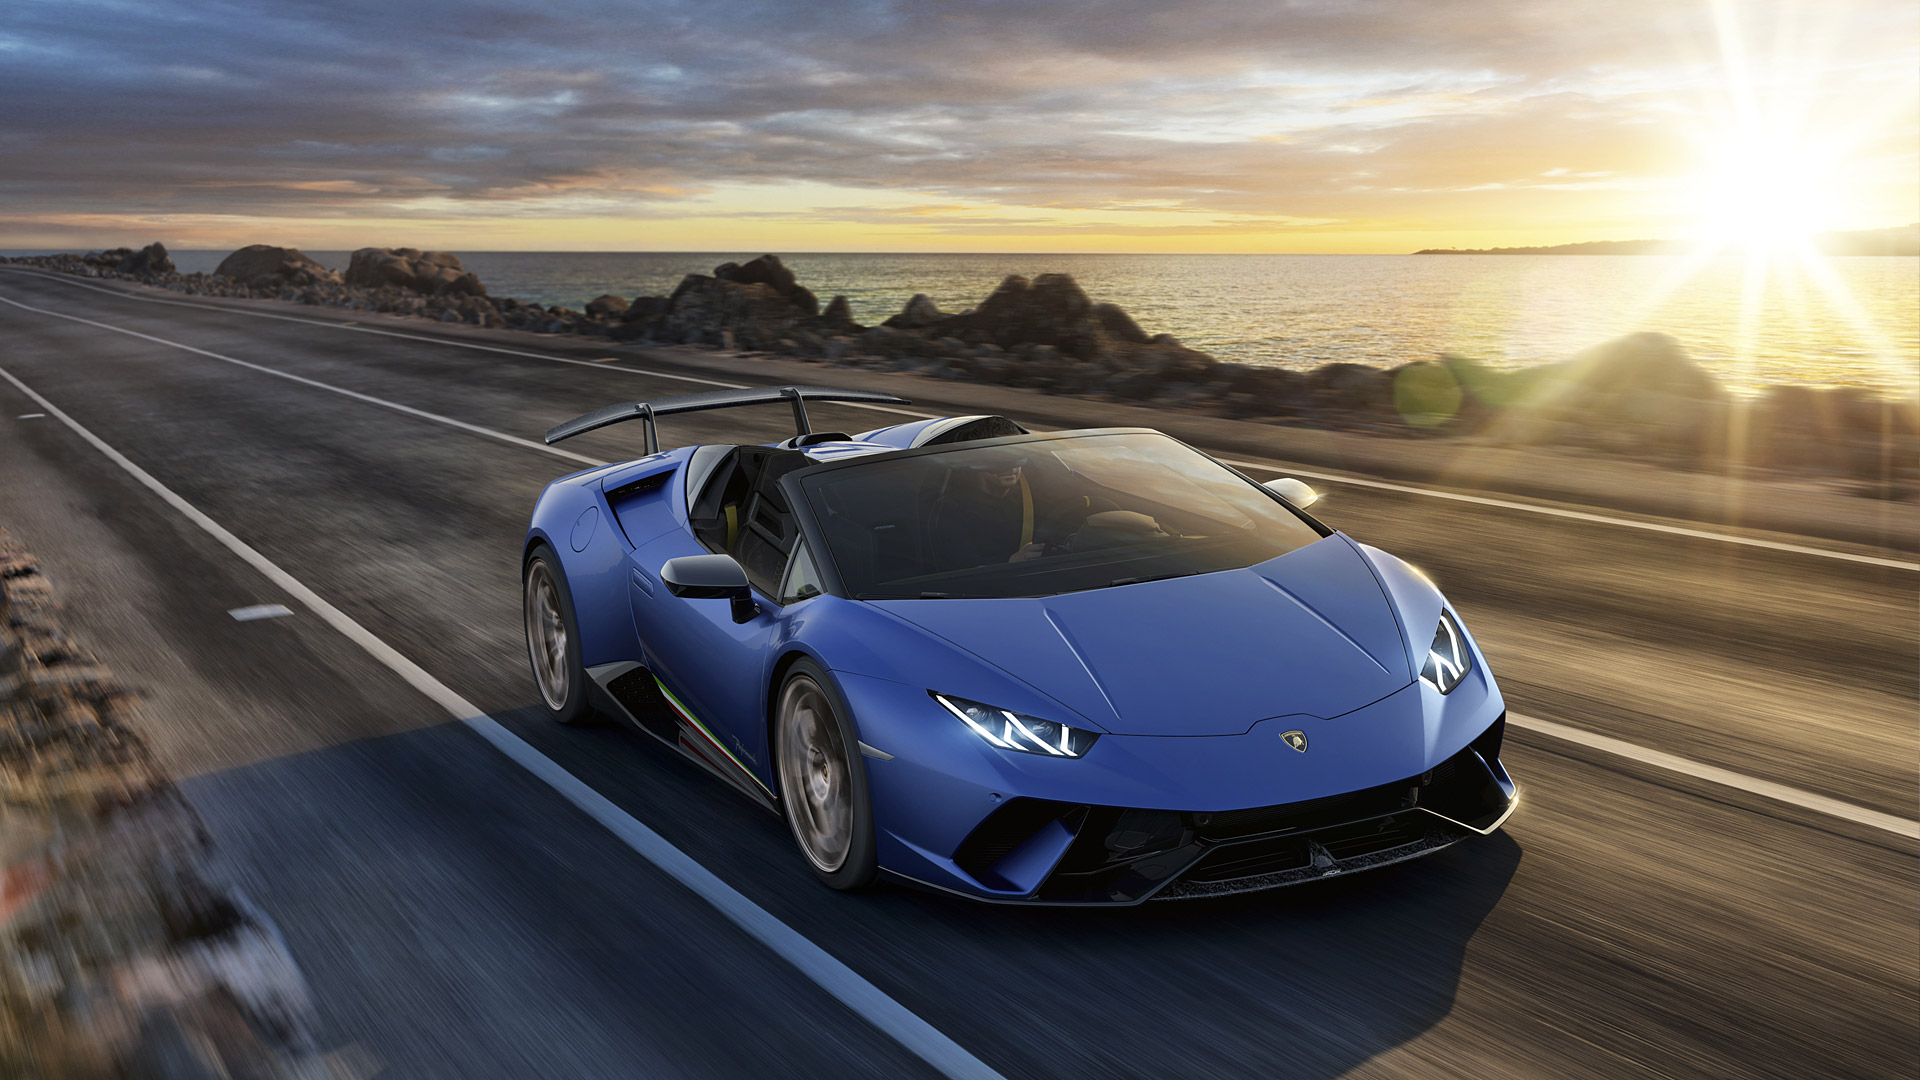 2019 Lamborghini Huracan Performante Spyder Wallpapers HD Images 1920x1080